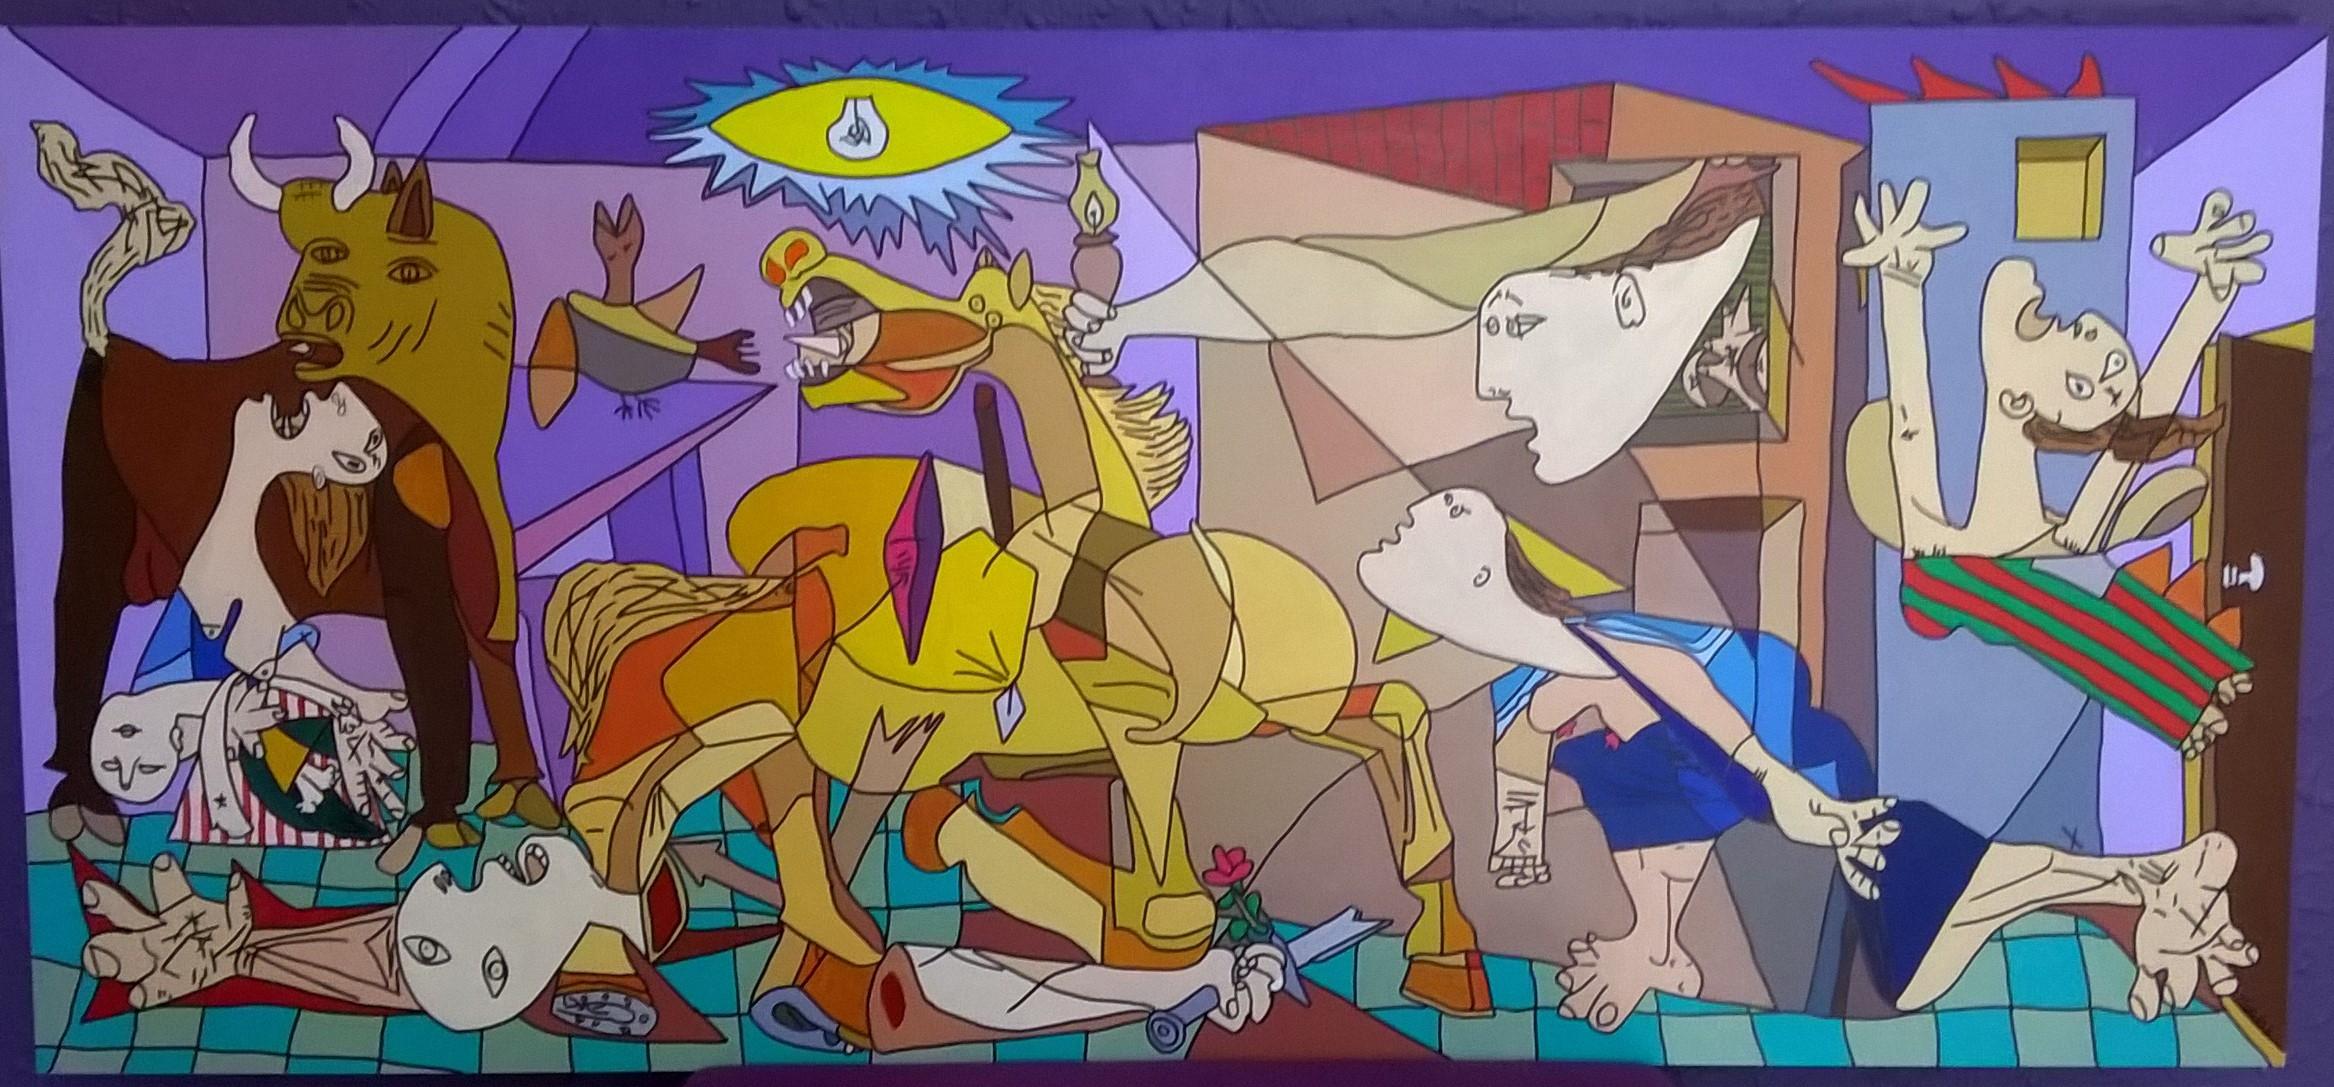 Guernicacolor 6